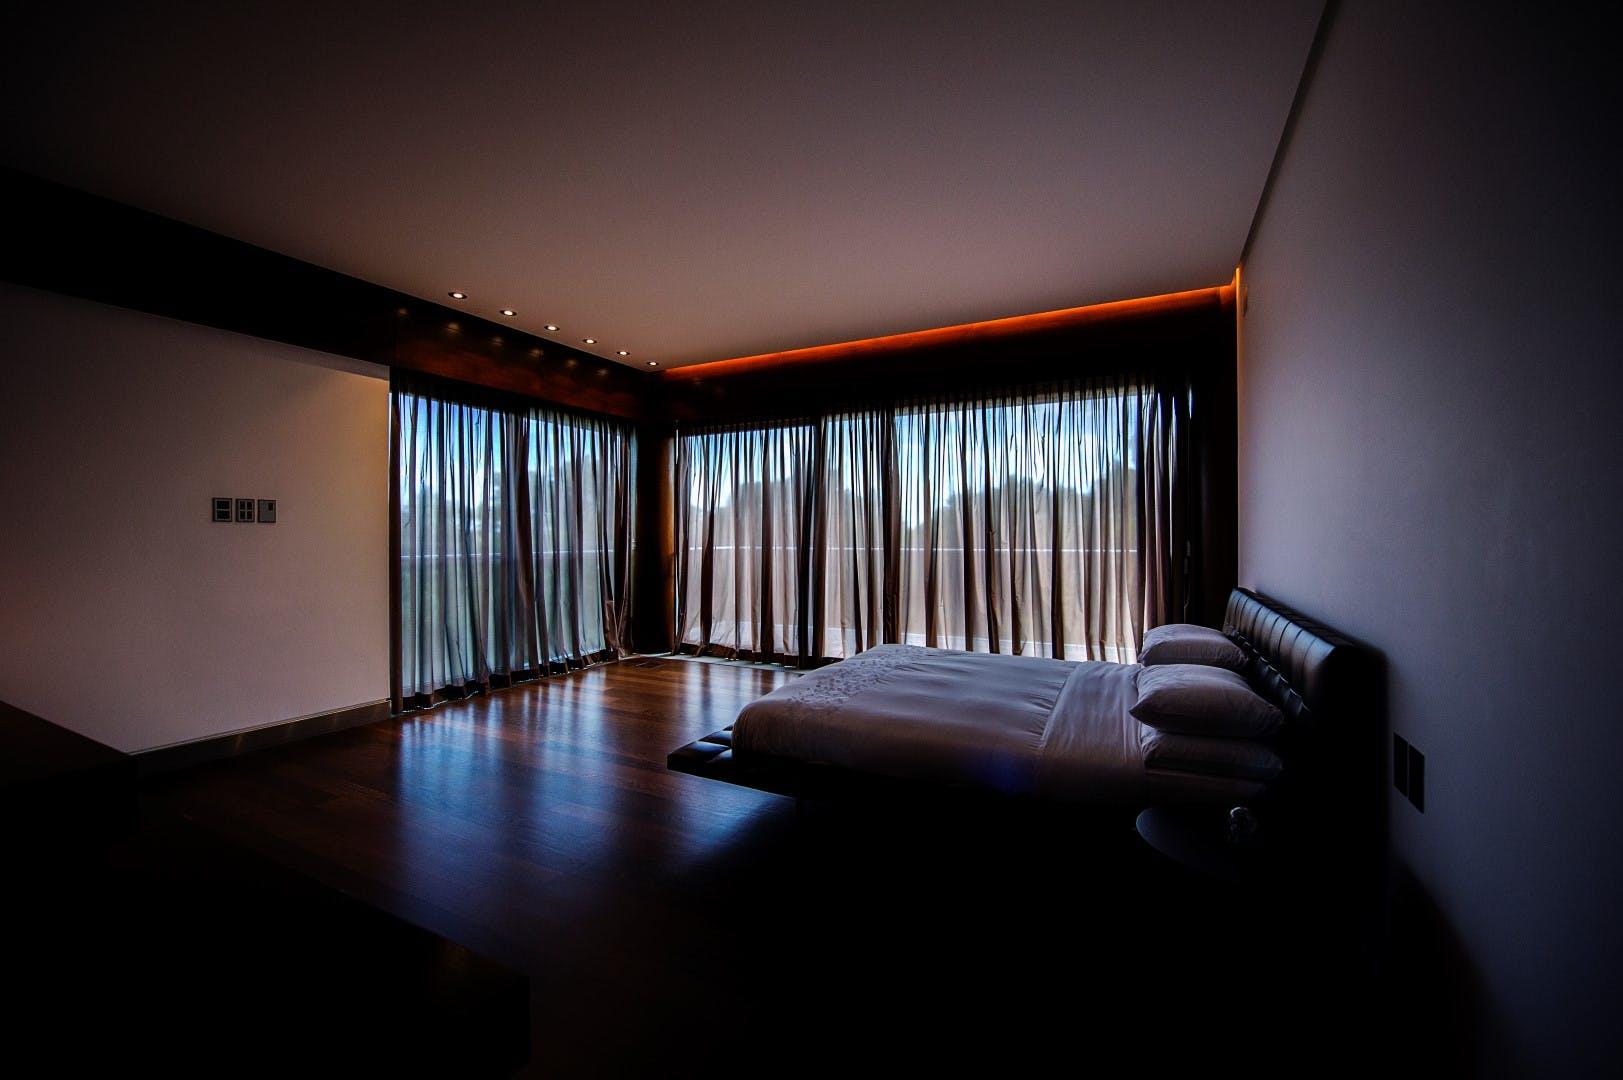 Dormitor penthouse spatios